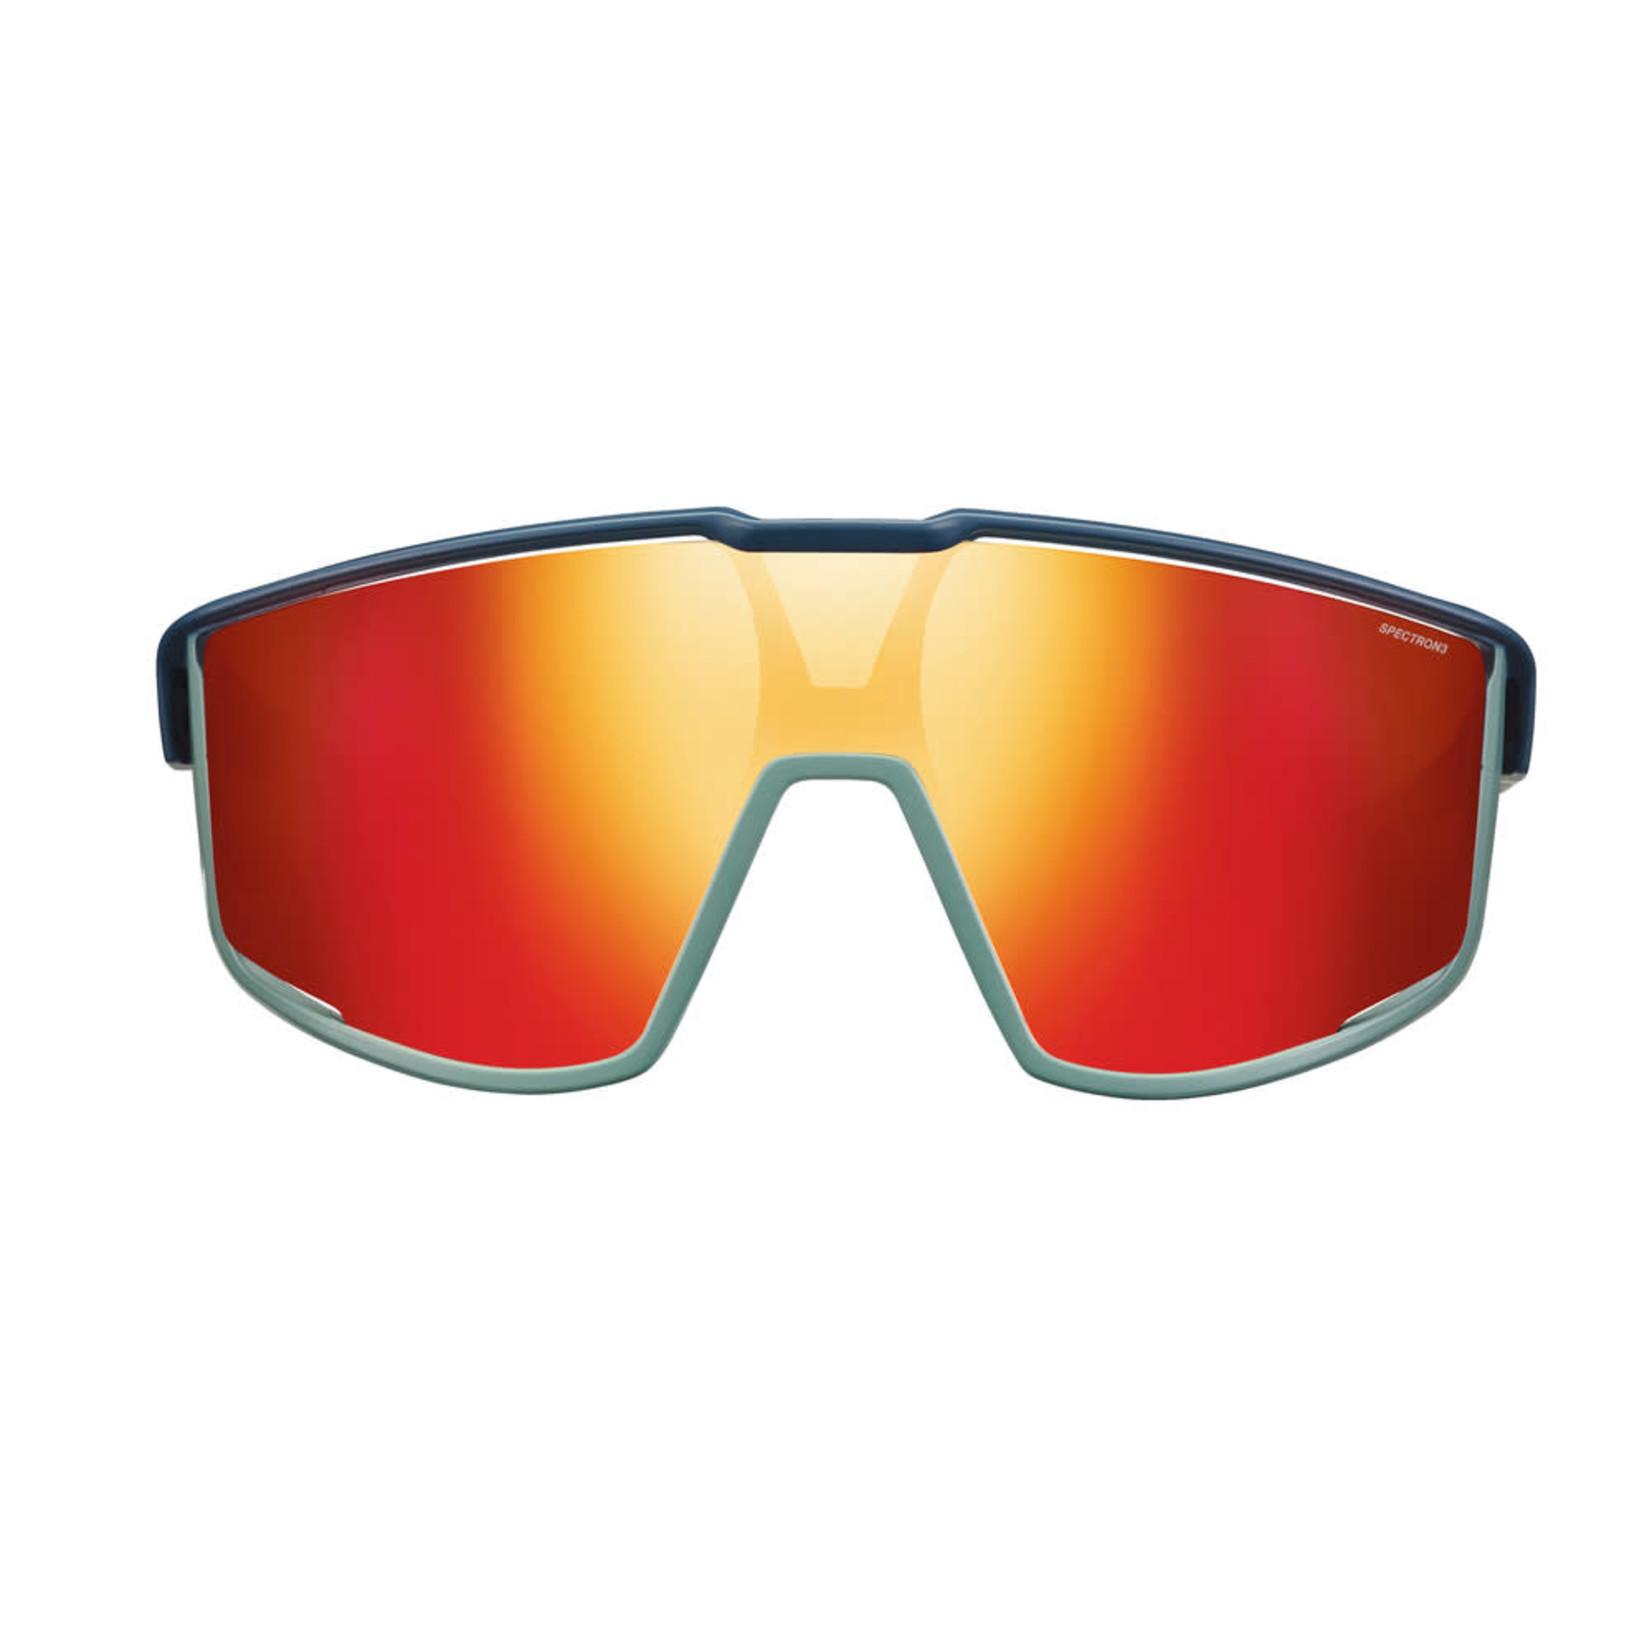 Julbo Julbo occhiali Fury blu/verde Spectron 3